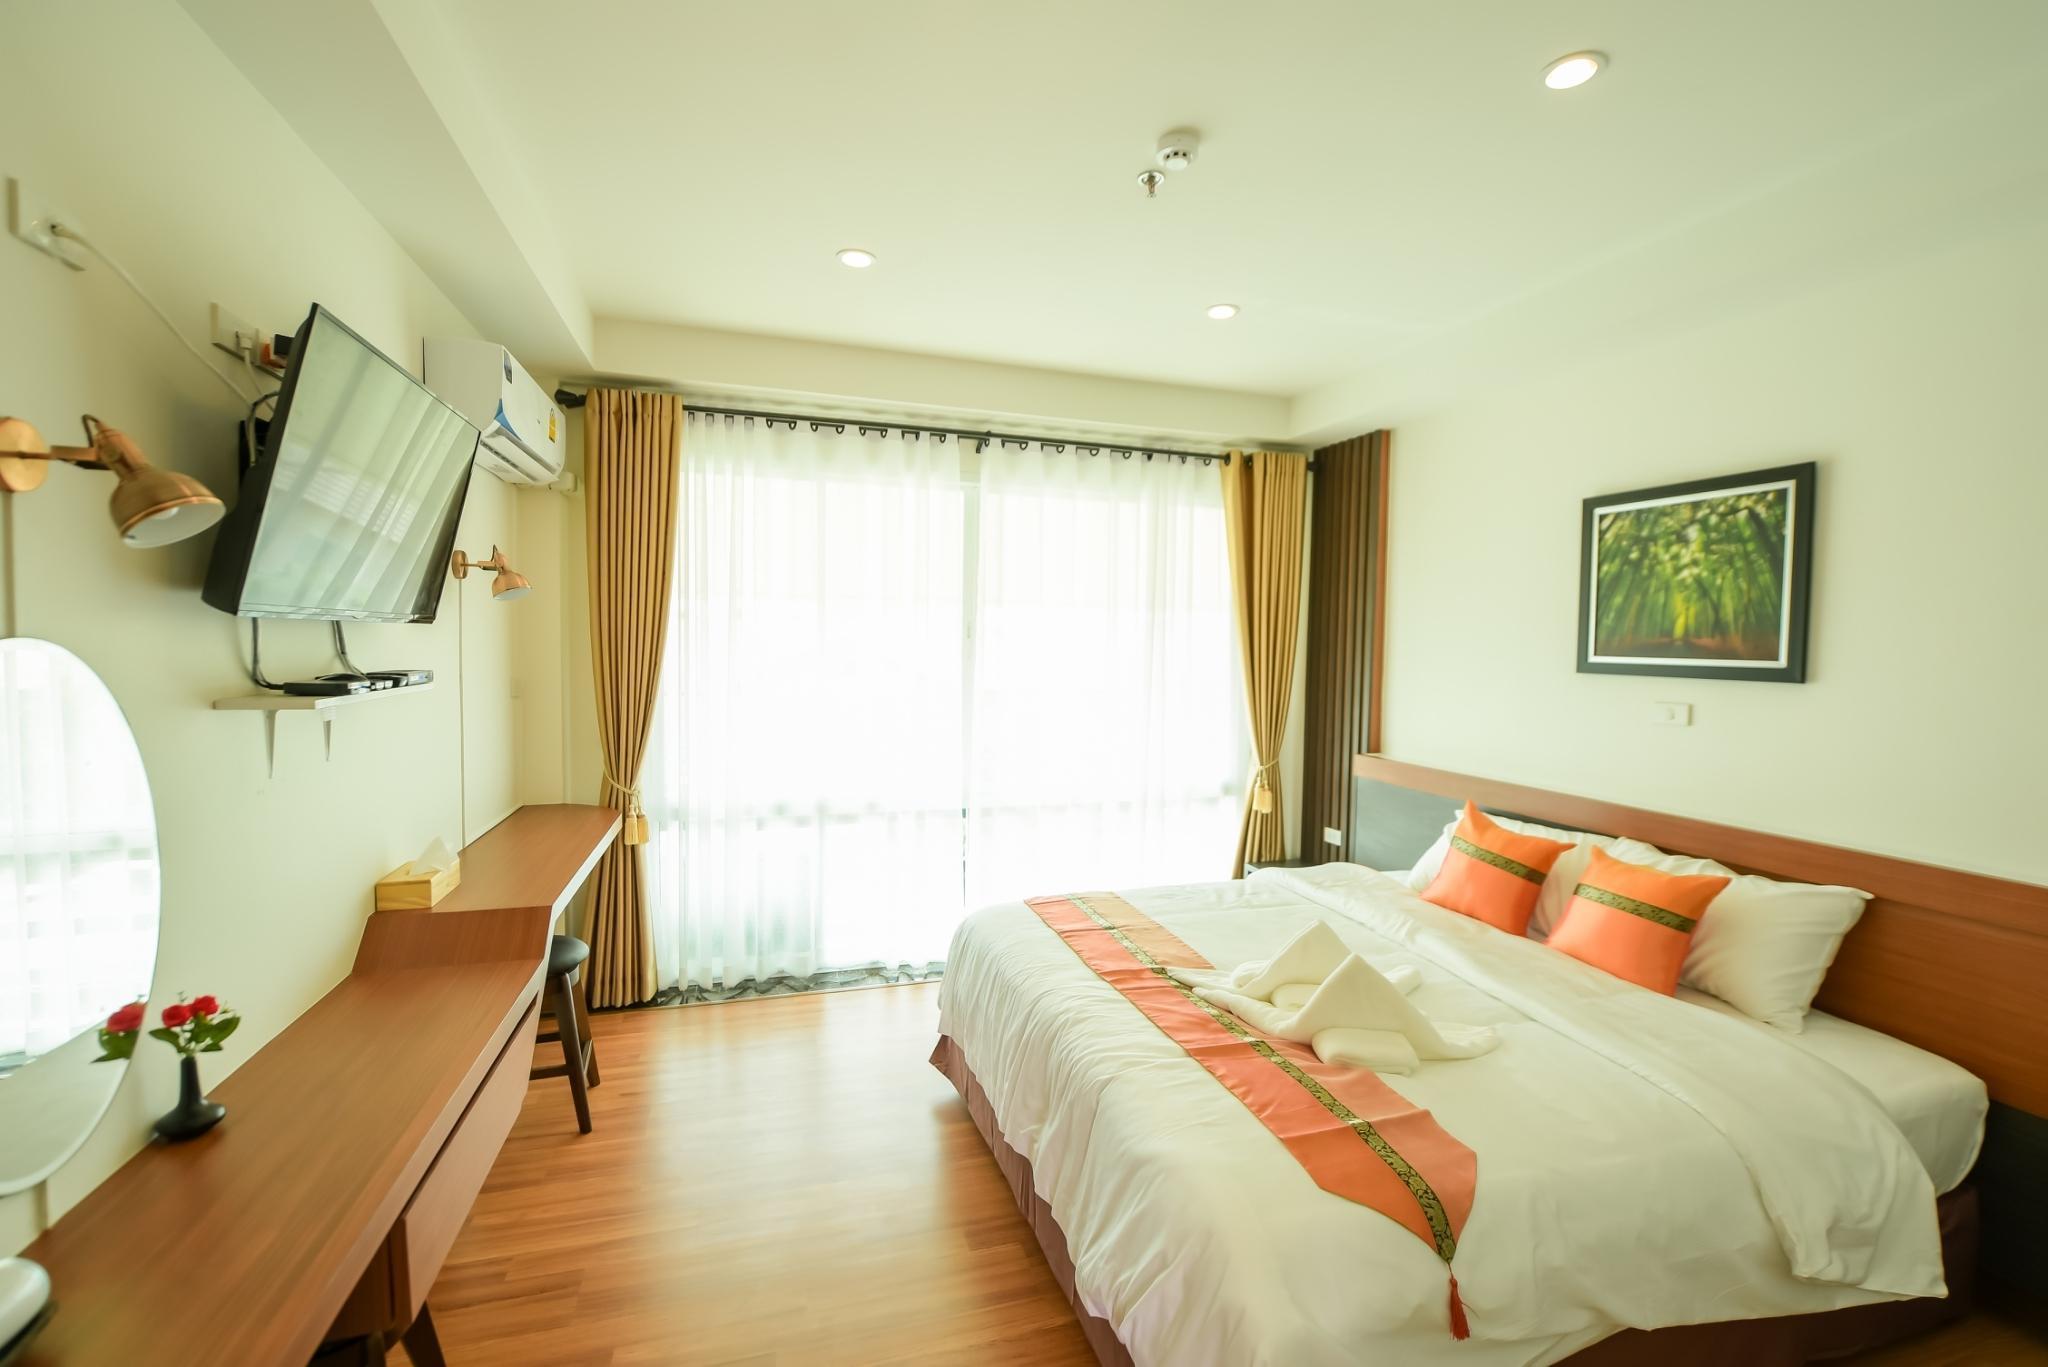 MS Hotel&resort Sriracha โรงแรม เอ็มเอส รีสอร์ท ศรีราชา